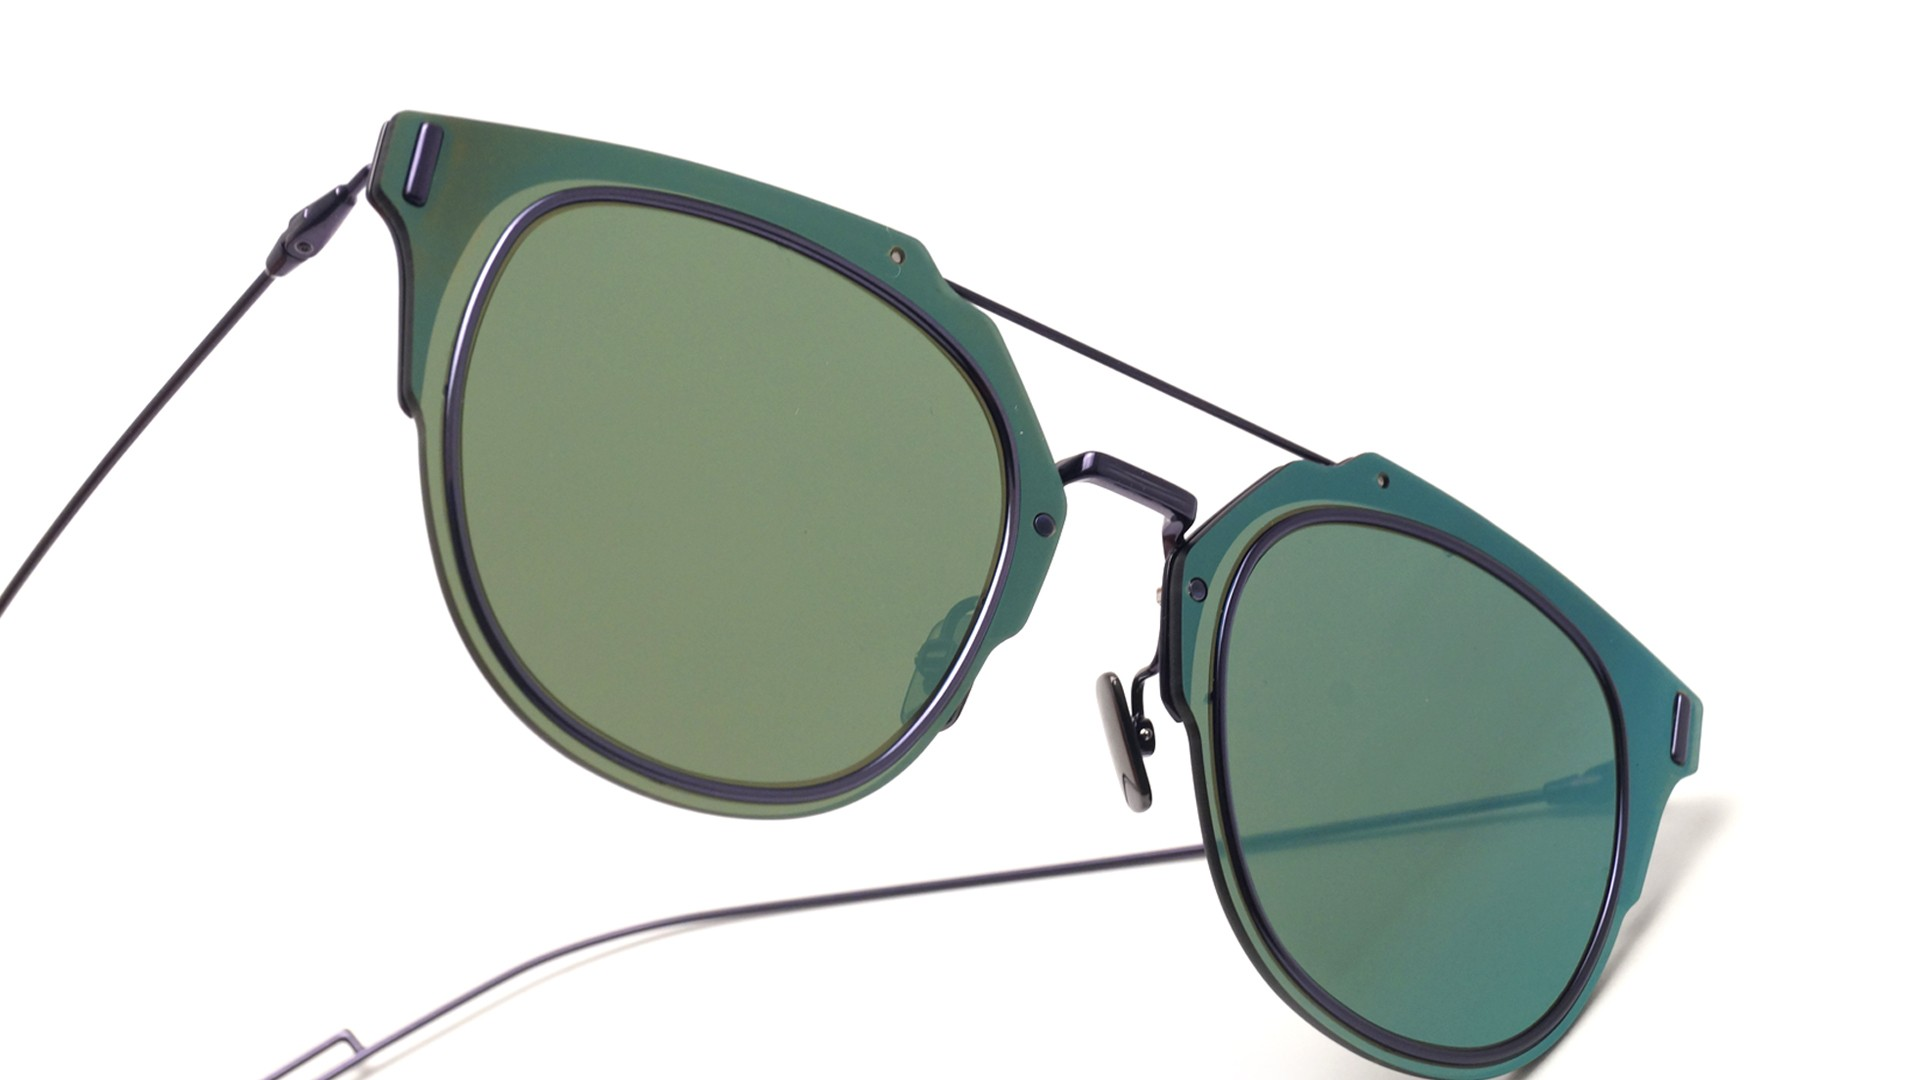 c71392dbe7a Sunglasses Dior Composit 1.0 Black COMPOSIT1.0 A2J AF 62-12 Large Mirror